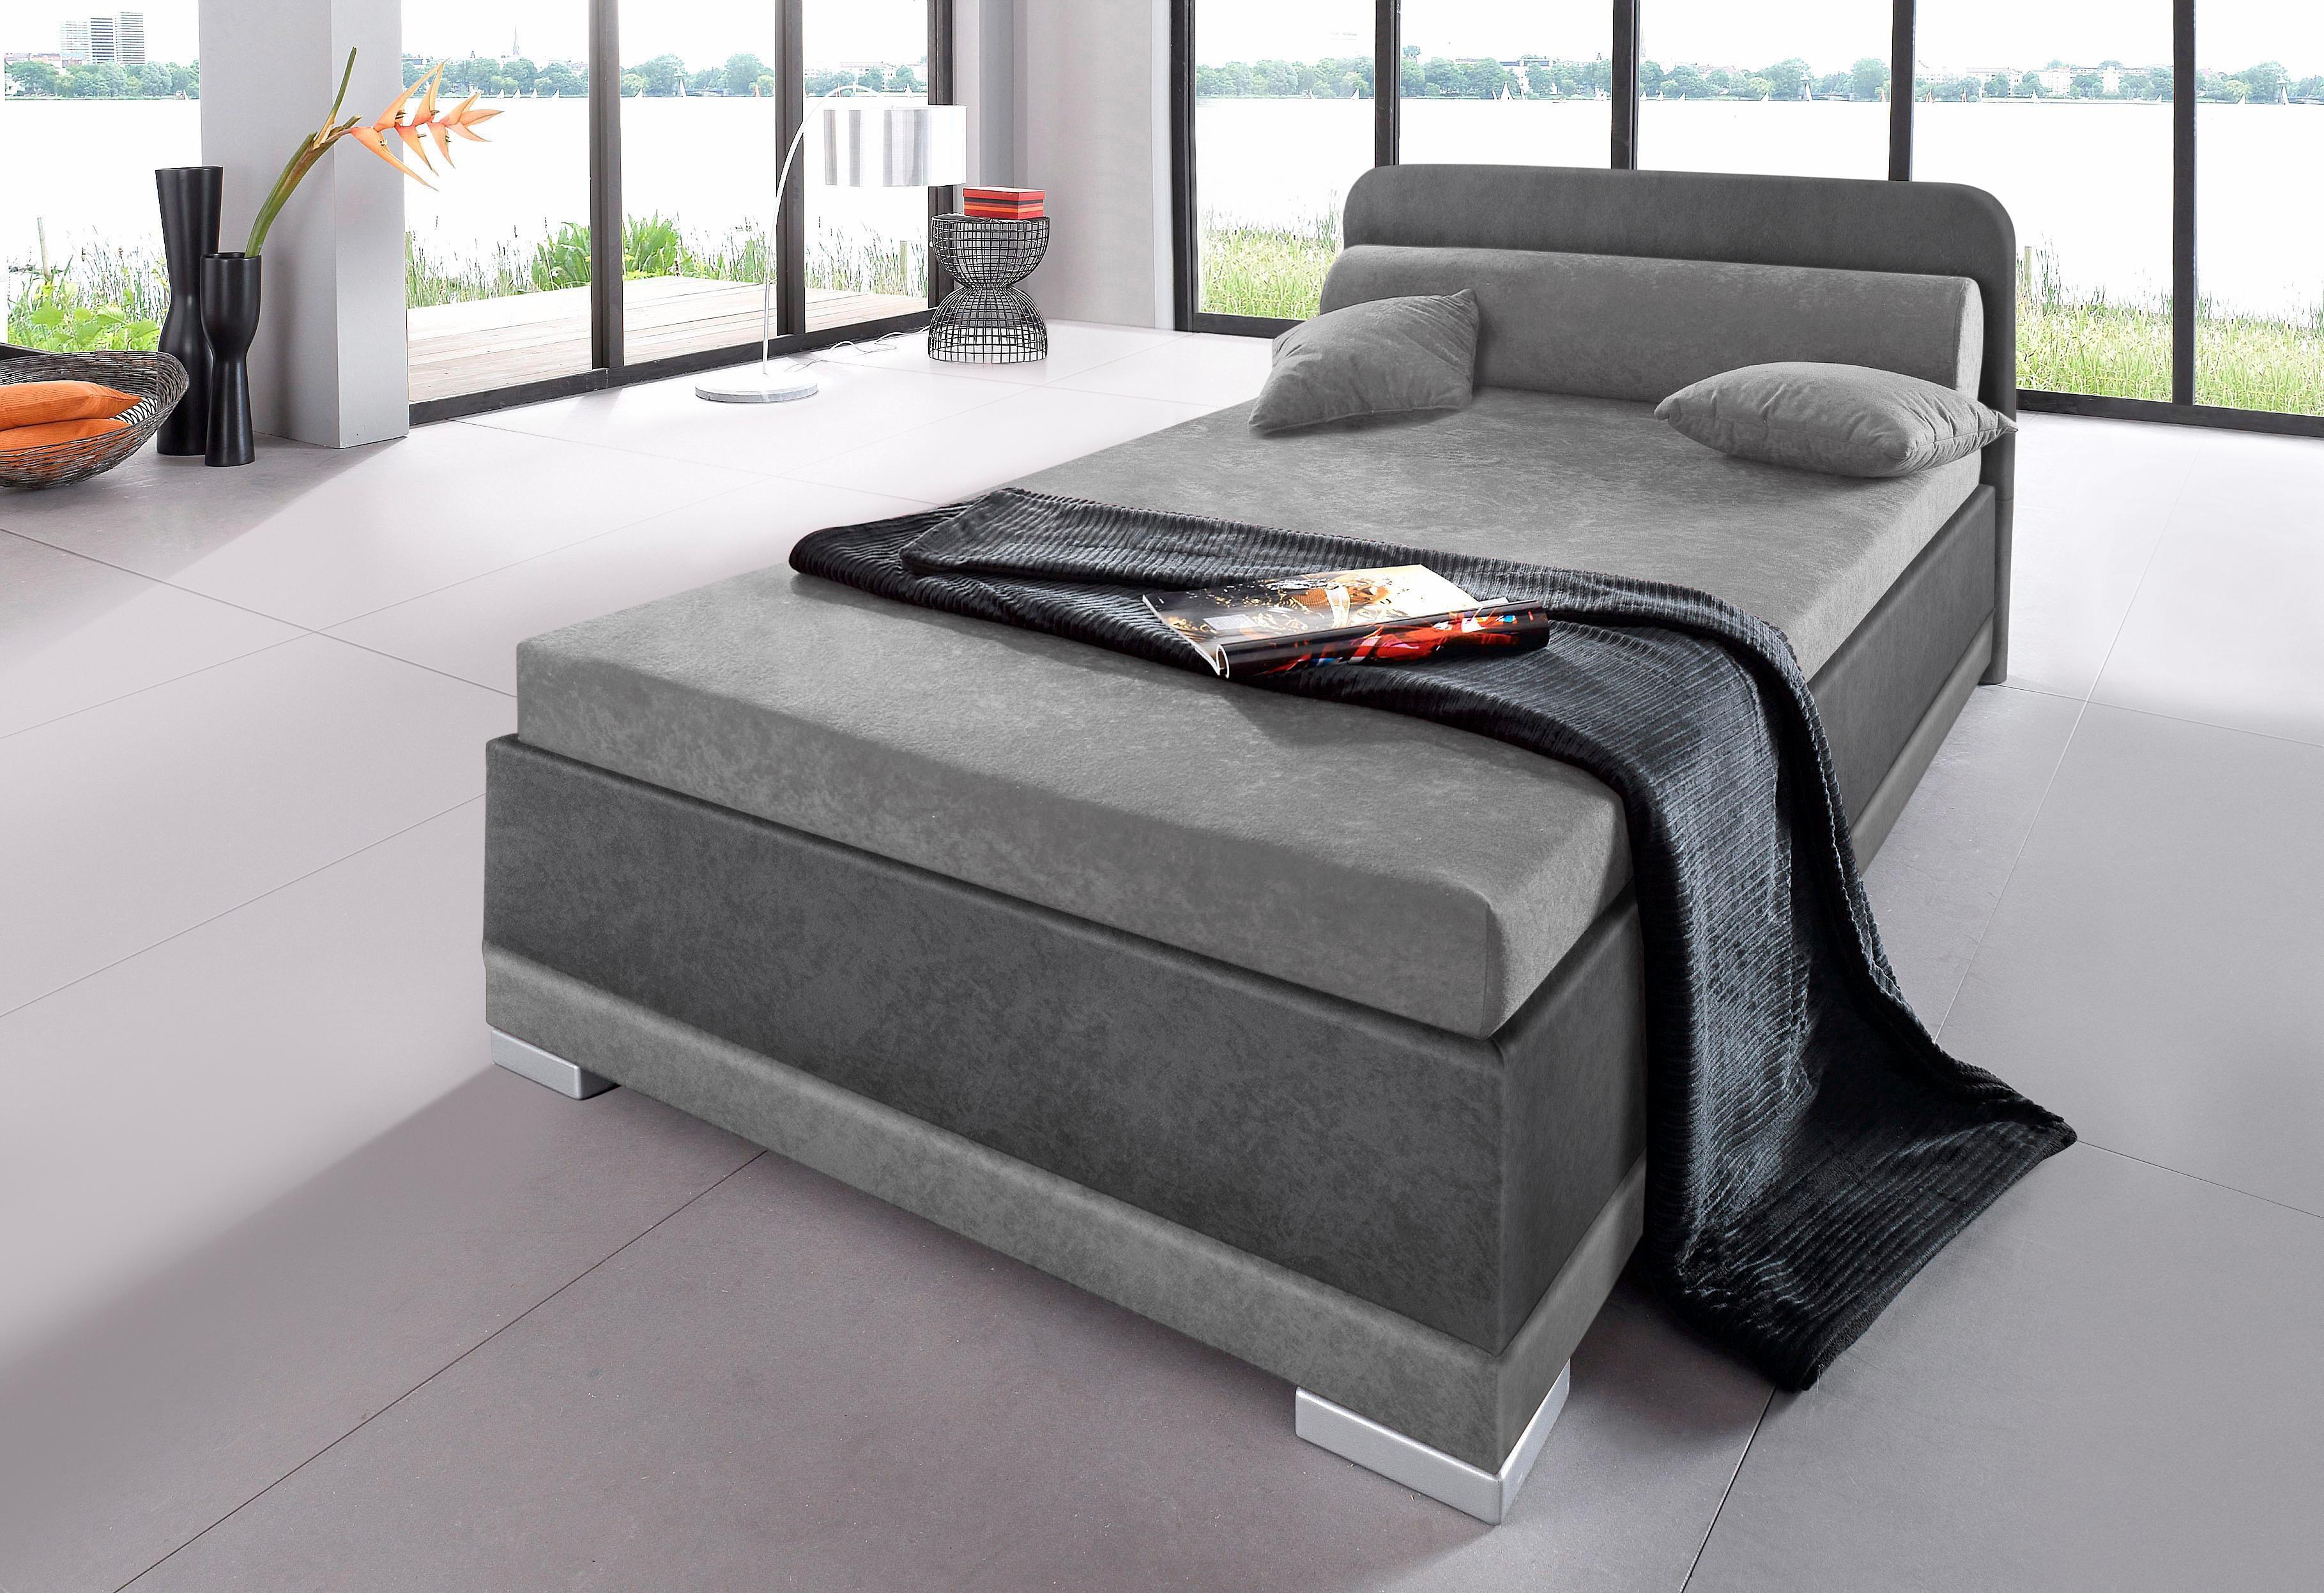 bekleed ledikant maintal micro velours in 6 verschillende uitvoeringen made in germany snel. Black Bedroom Furniture Sets. Home Design Ideas